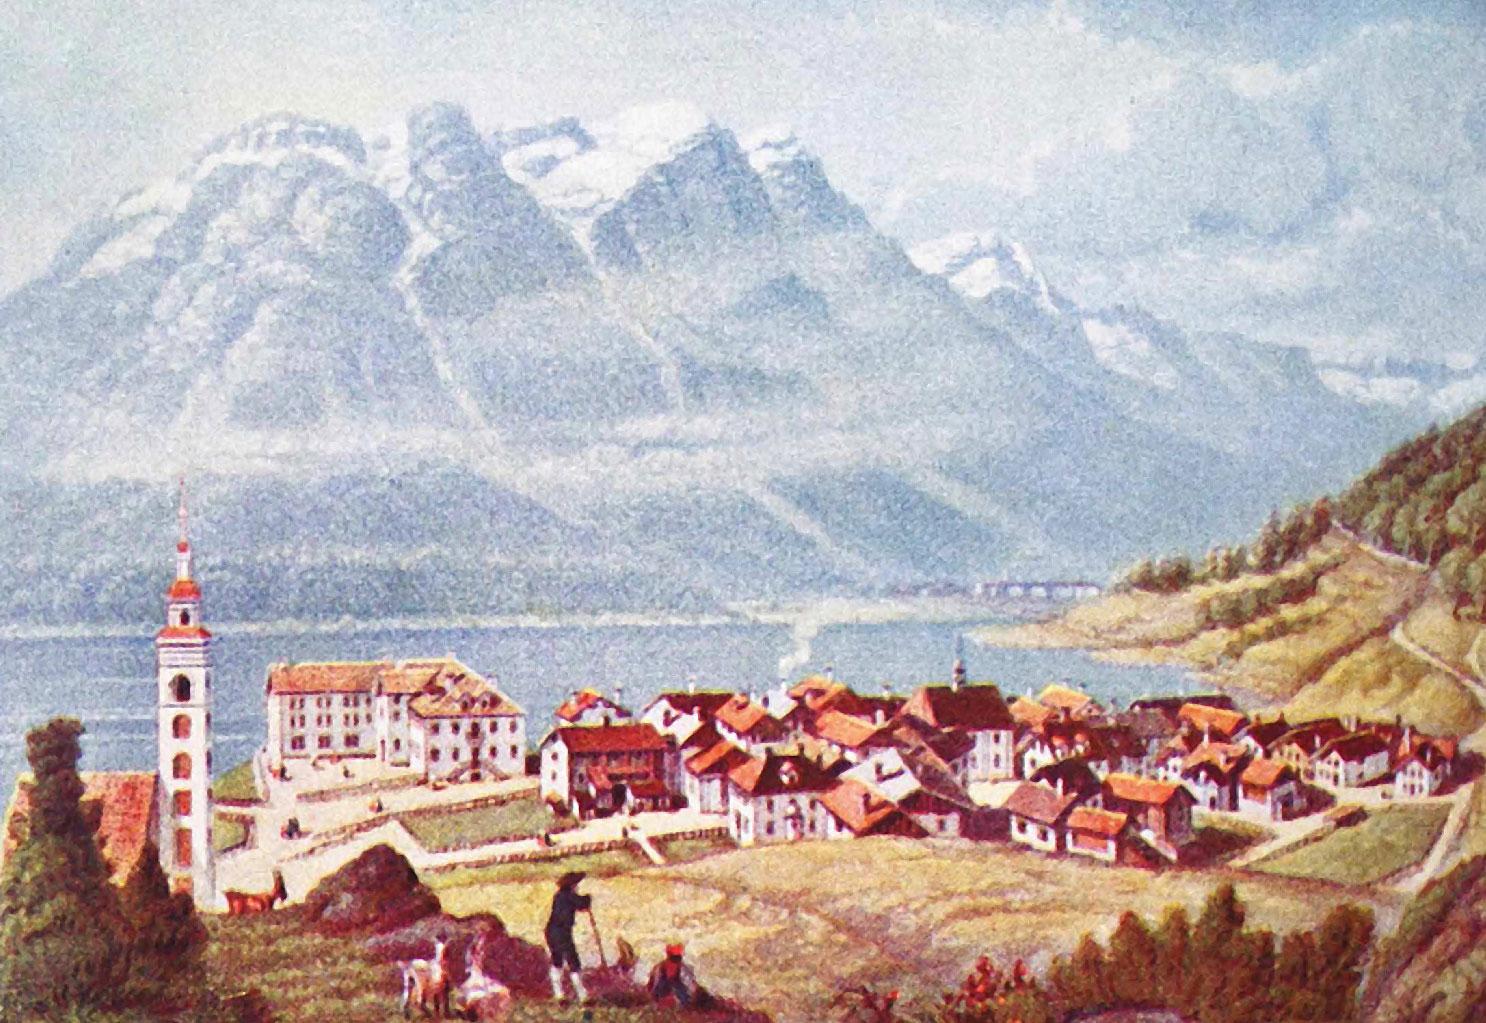 Historic engraving of St. Moritz